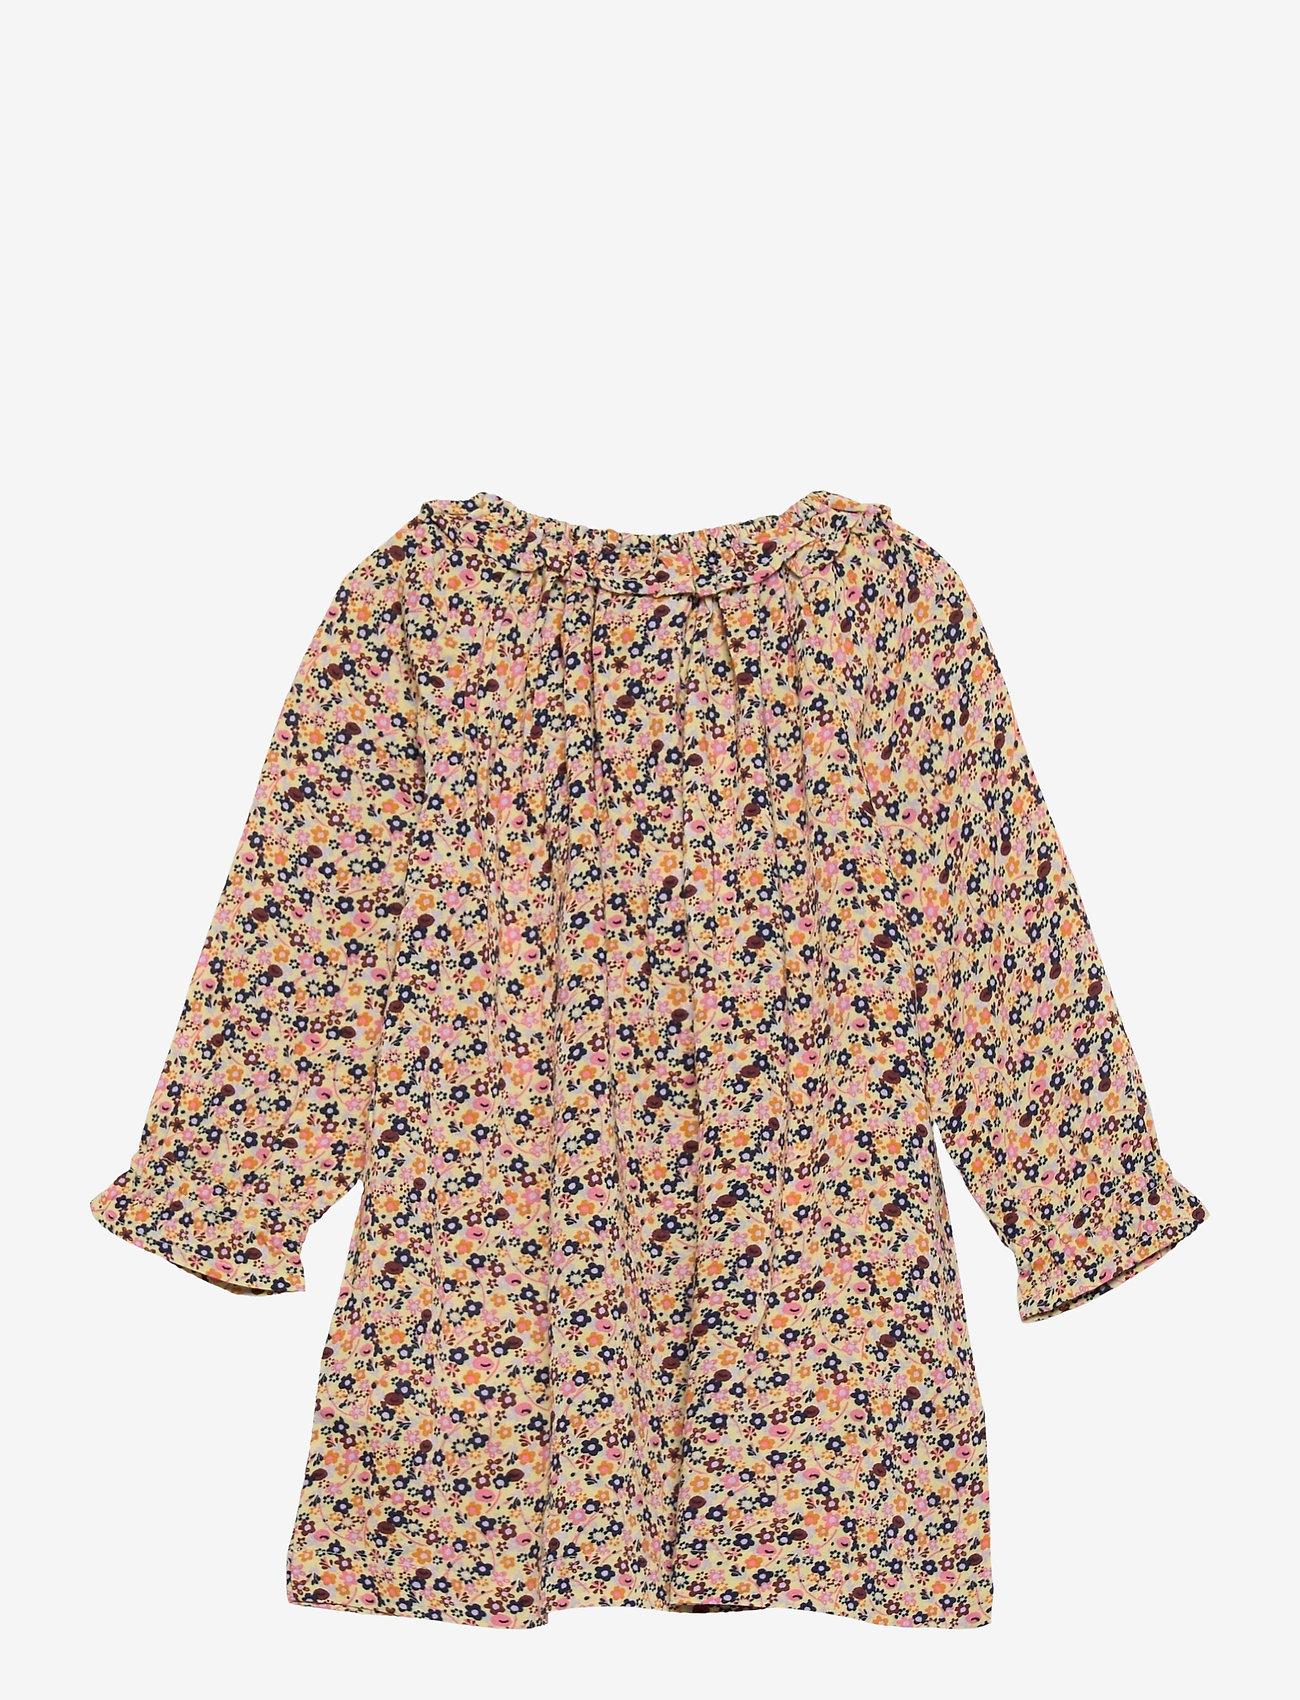 Noa Noa Miniature - Dress long sleeve - kleider - print yellow - 1